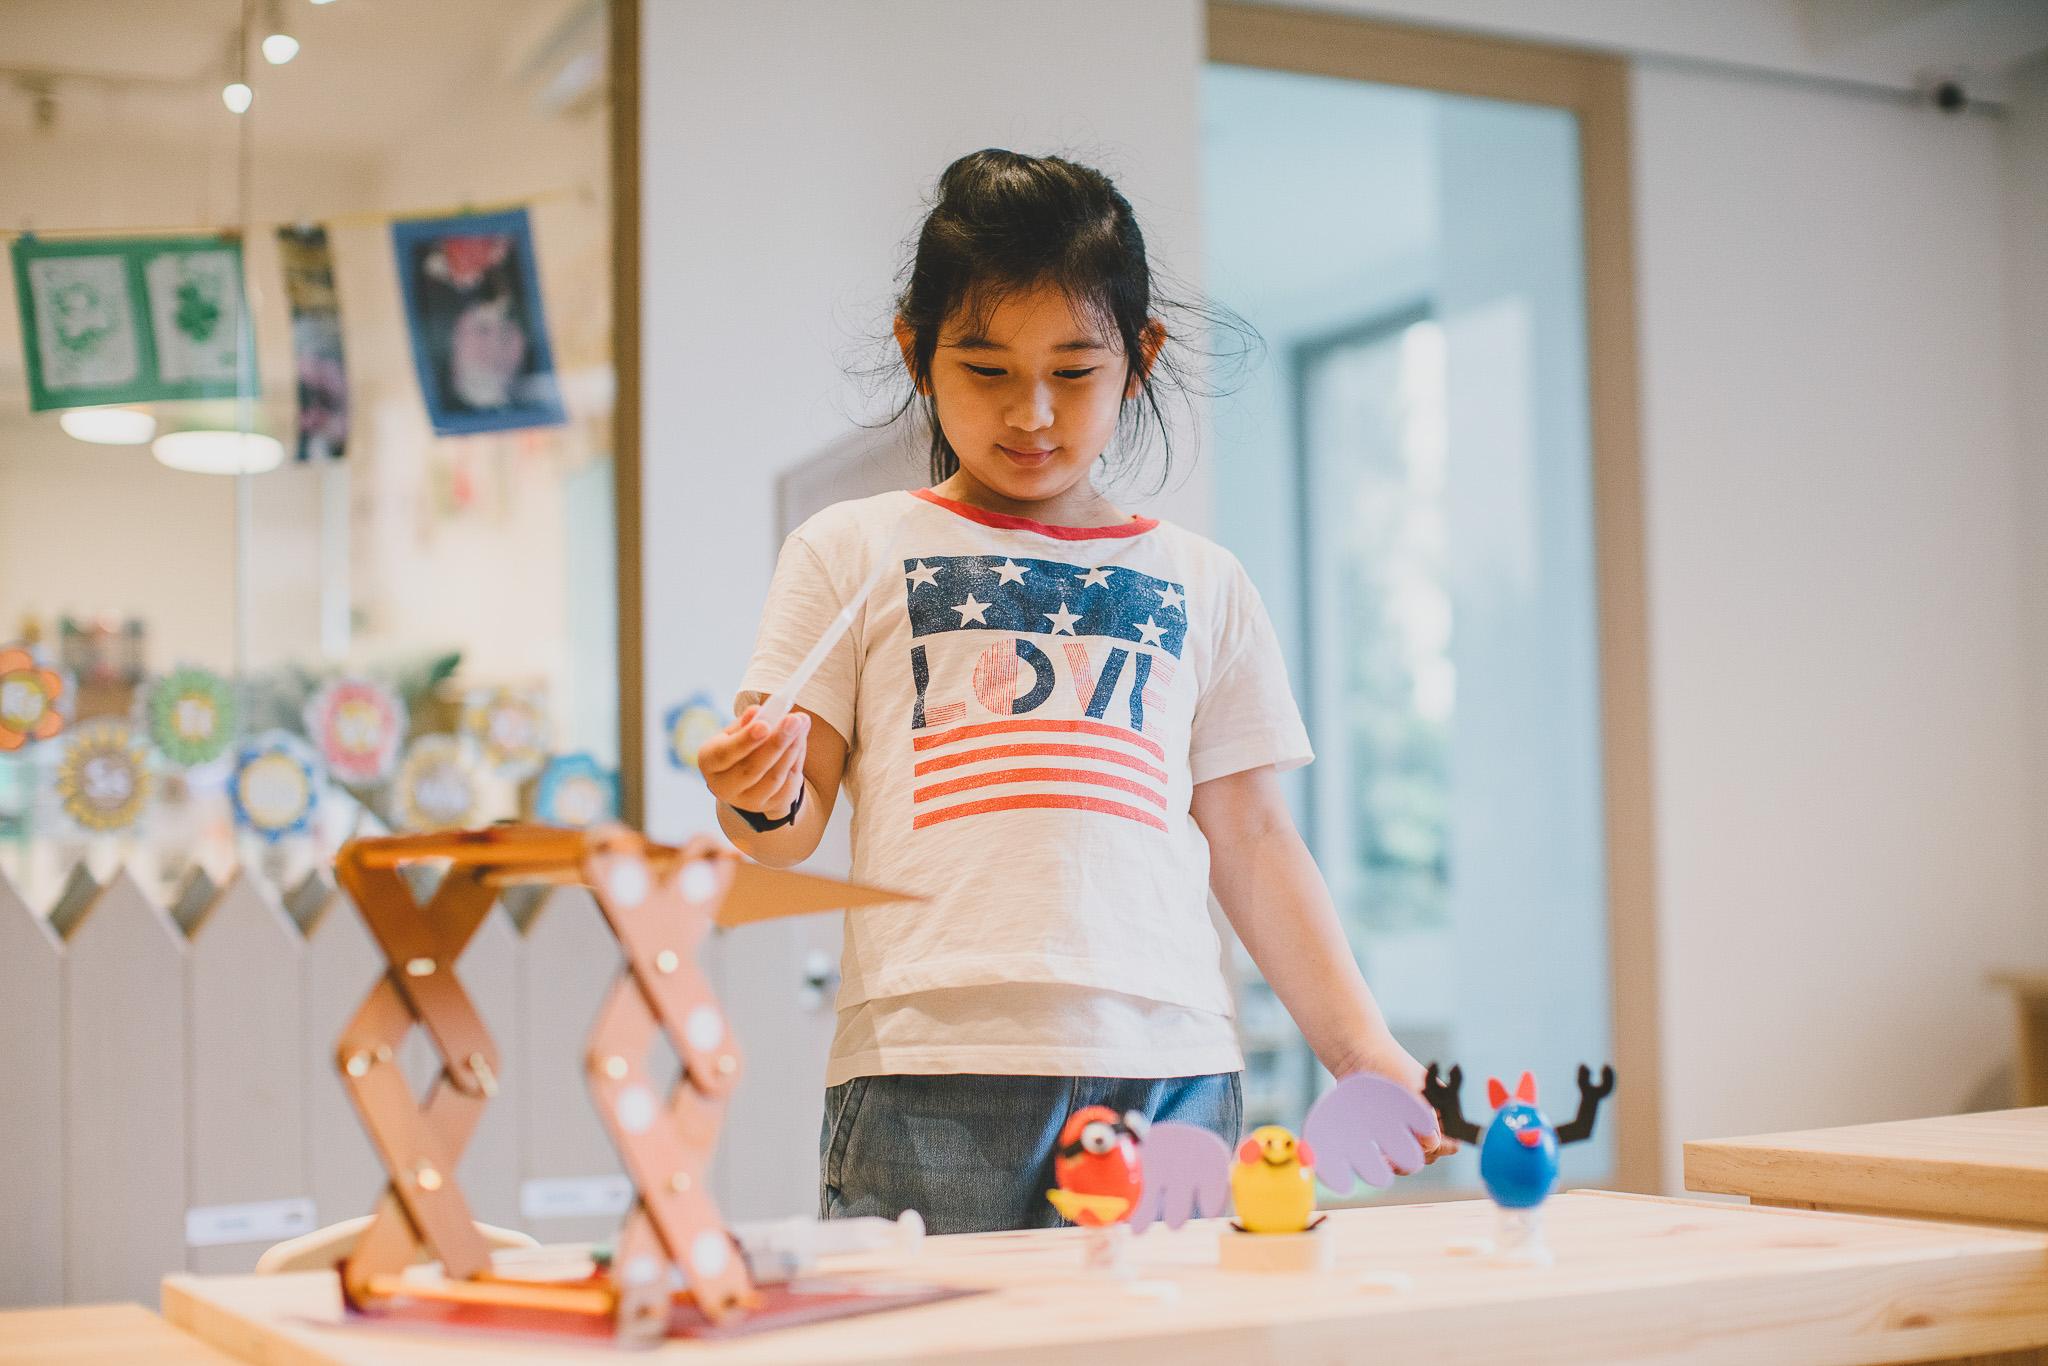 A child plays with a handmade cardboard hydraulic lift